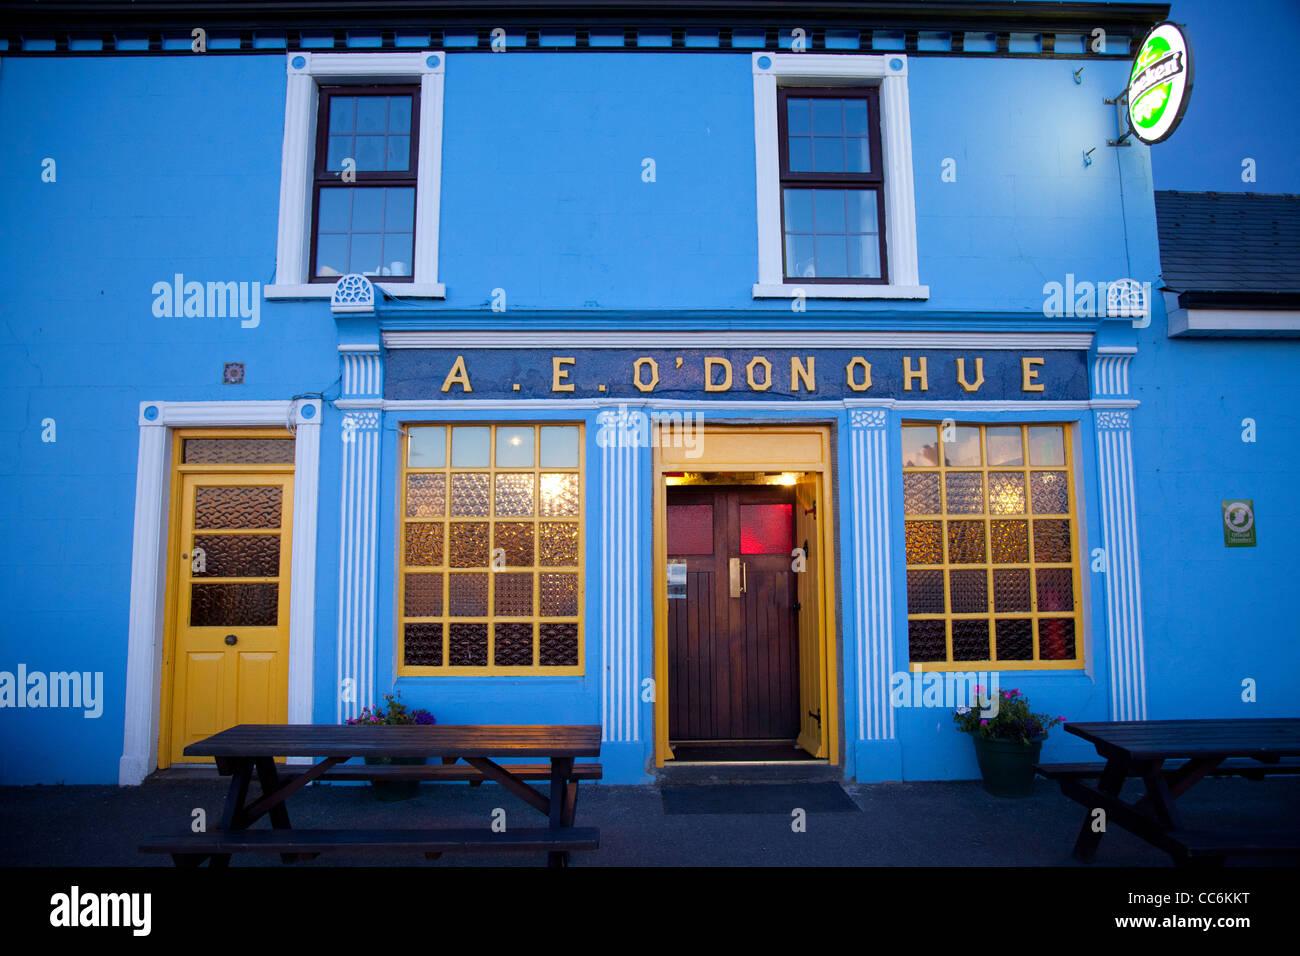 Façade colorée de O'Donohue's pub, Fanore, comté de Clare, Irlande. Photo Stock